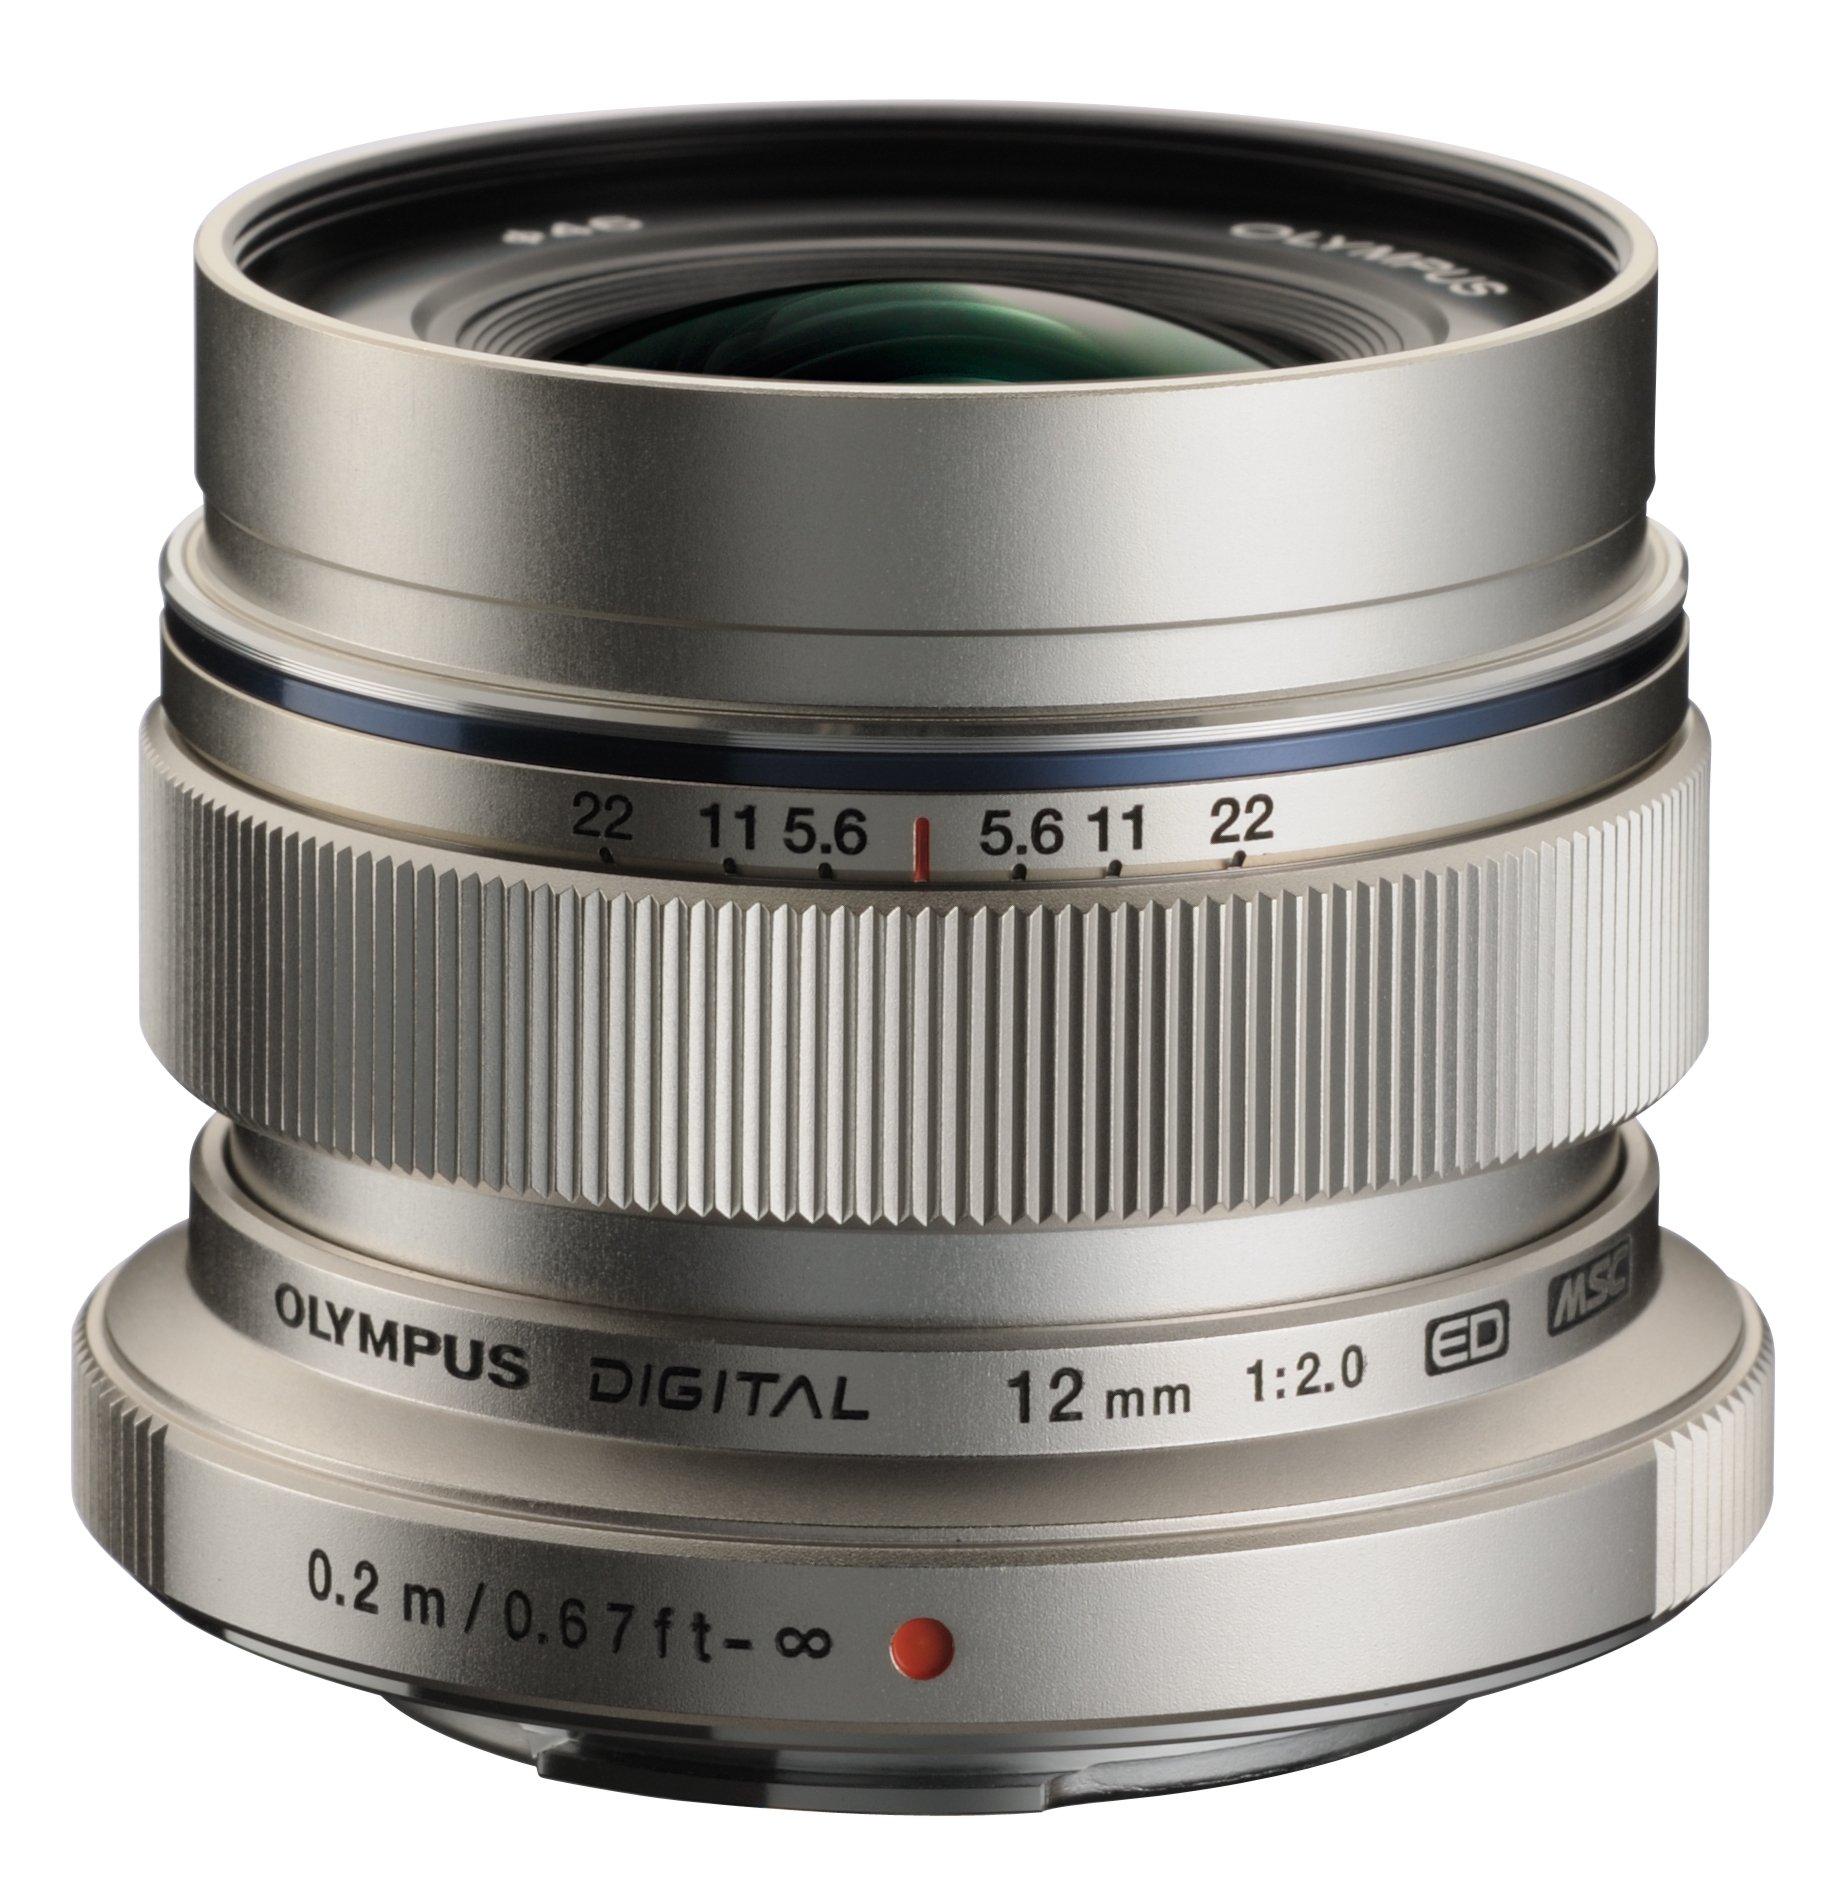 "Olympus M.zuiko Digital V311020su000 - 12 Mm - F/2 - Wide Angle Lens For Micro Four Thirds - 46 Mm Attachment - 0.08x Magnification - 1.7""diameter (v311020su000)"